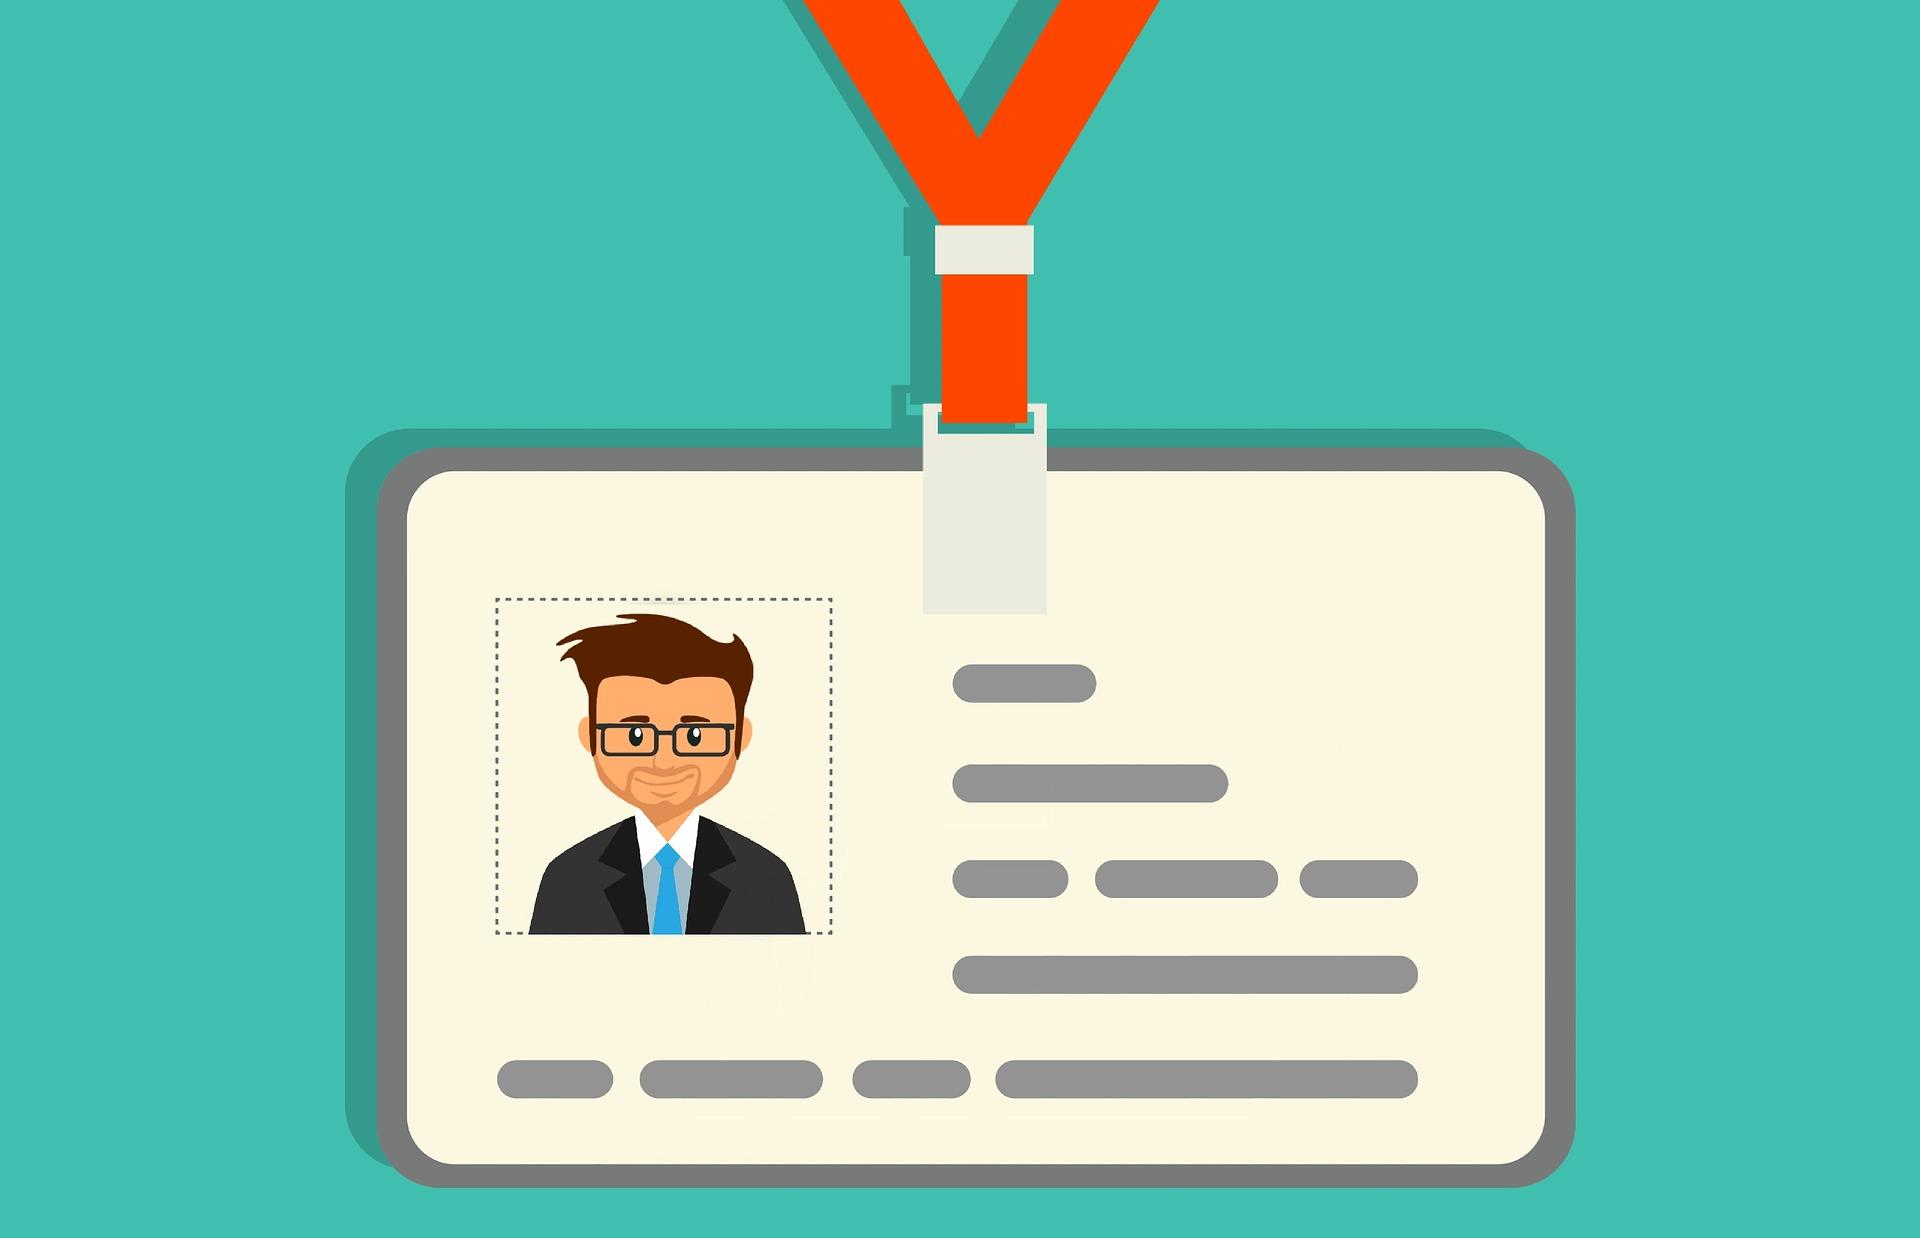 Improving Customer Service with Identity Verification